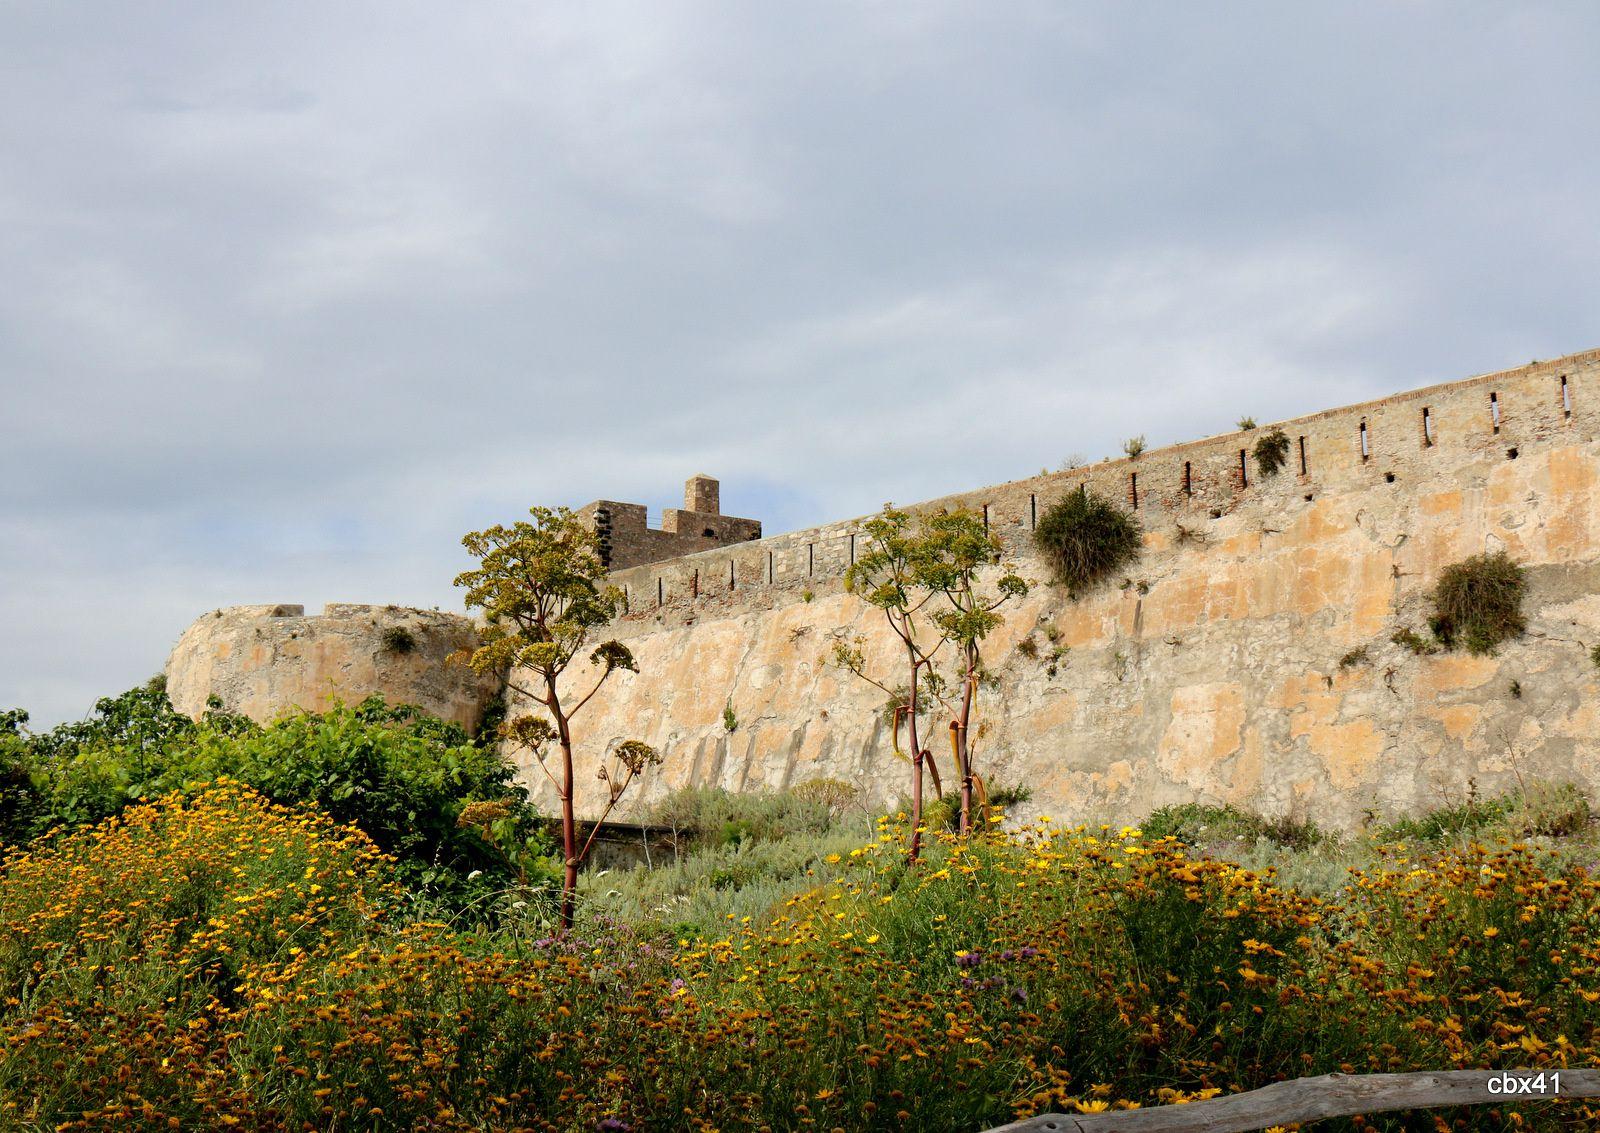 Le château de la citadelle de Milazzo